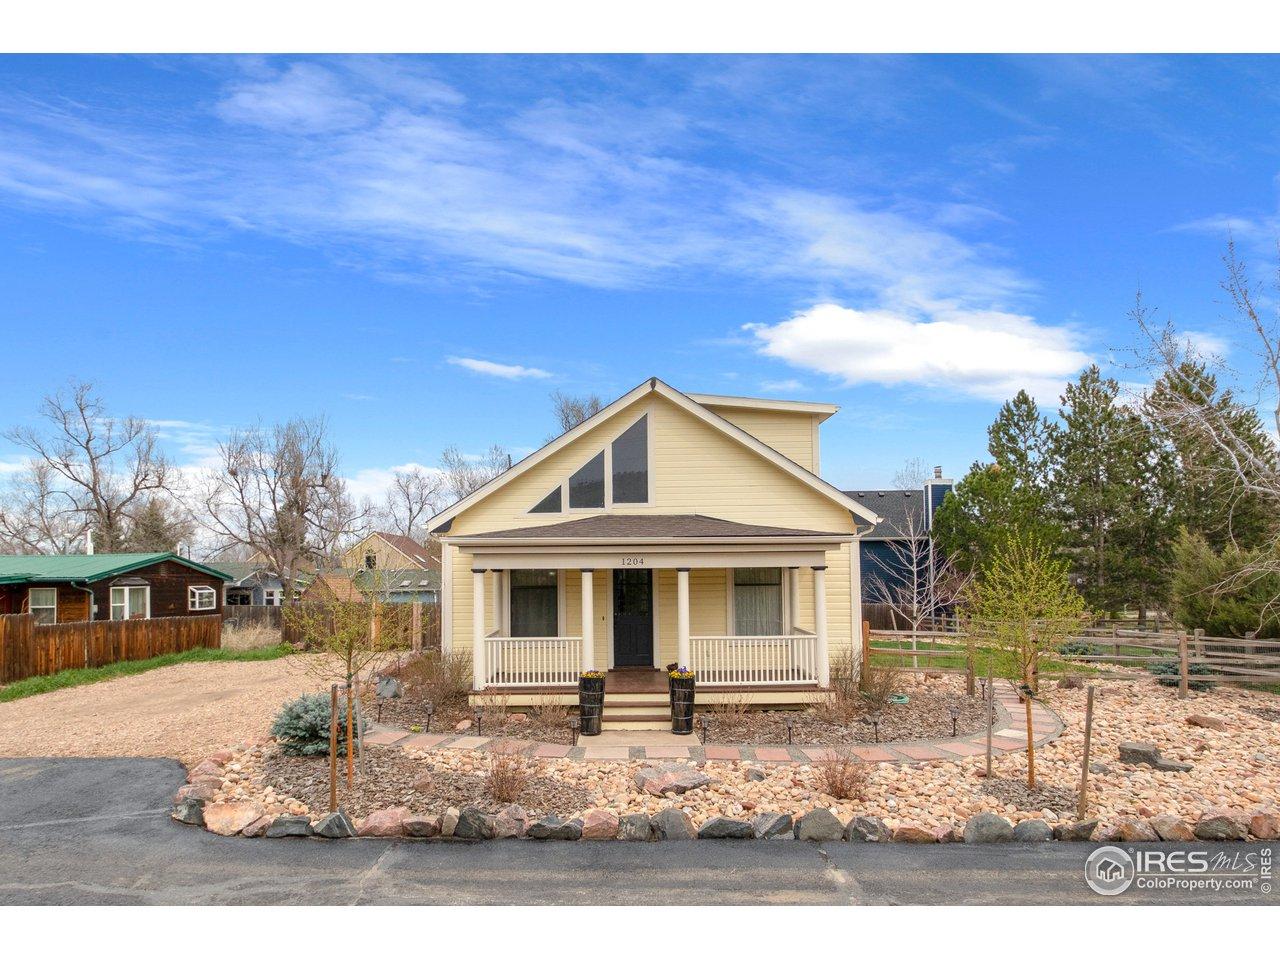 1204 Sumac Ave, Boulder CO 80304